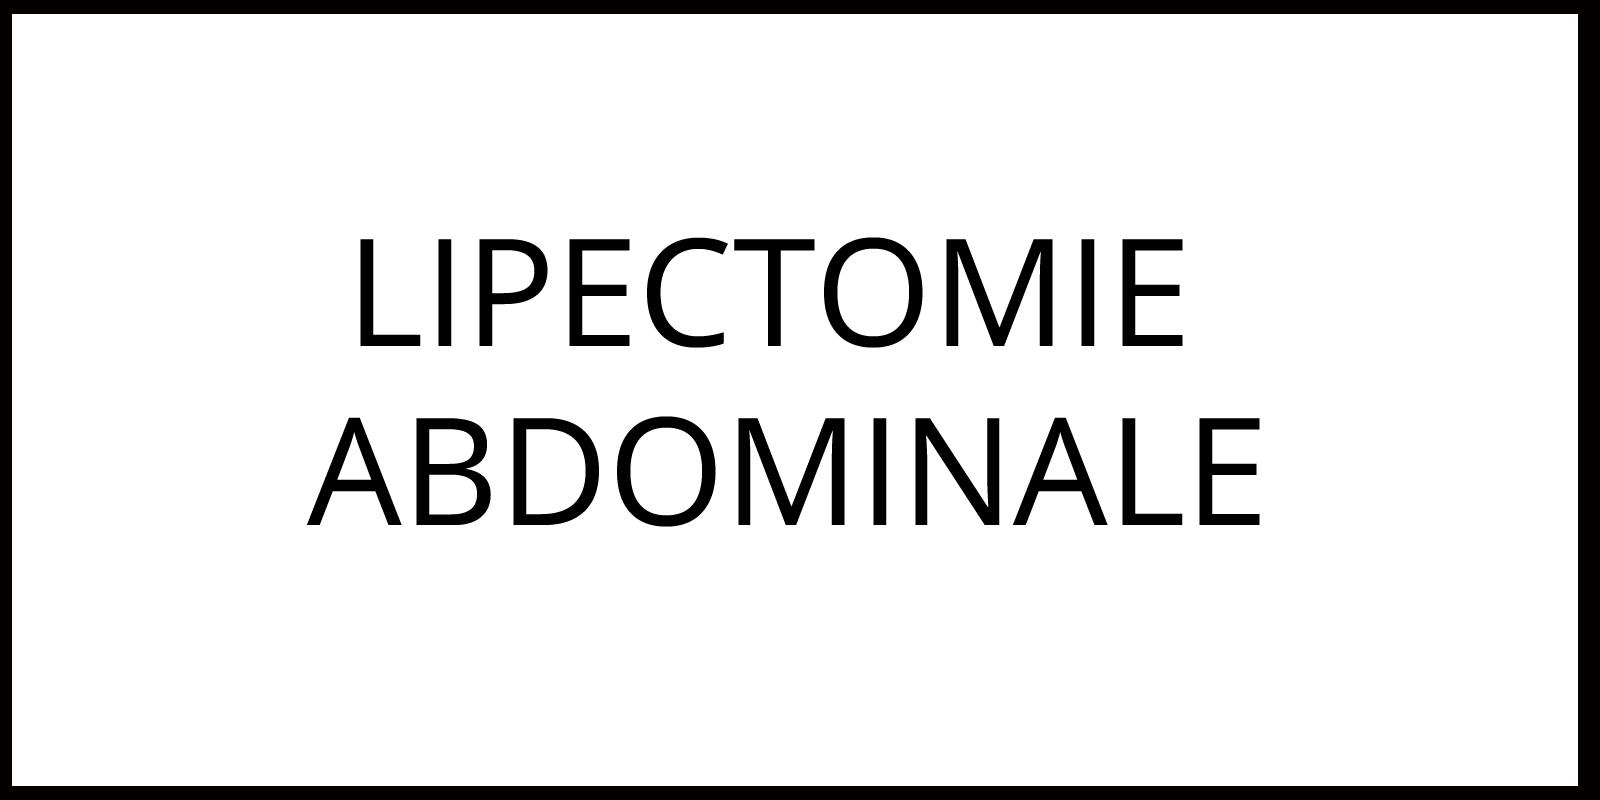 lipectomie abdominale Clinique Argonay